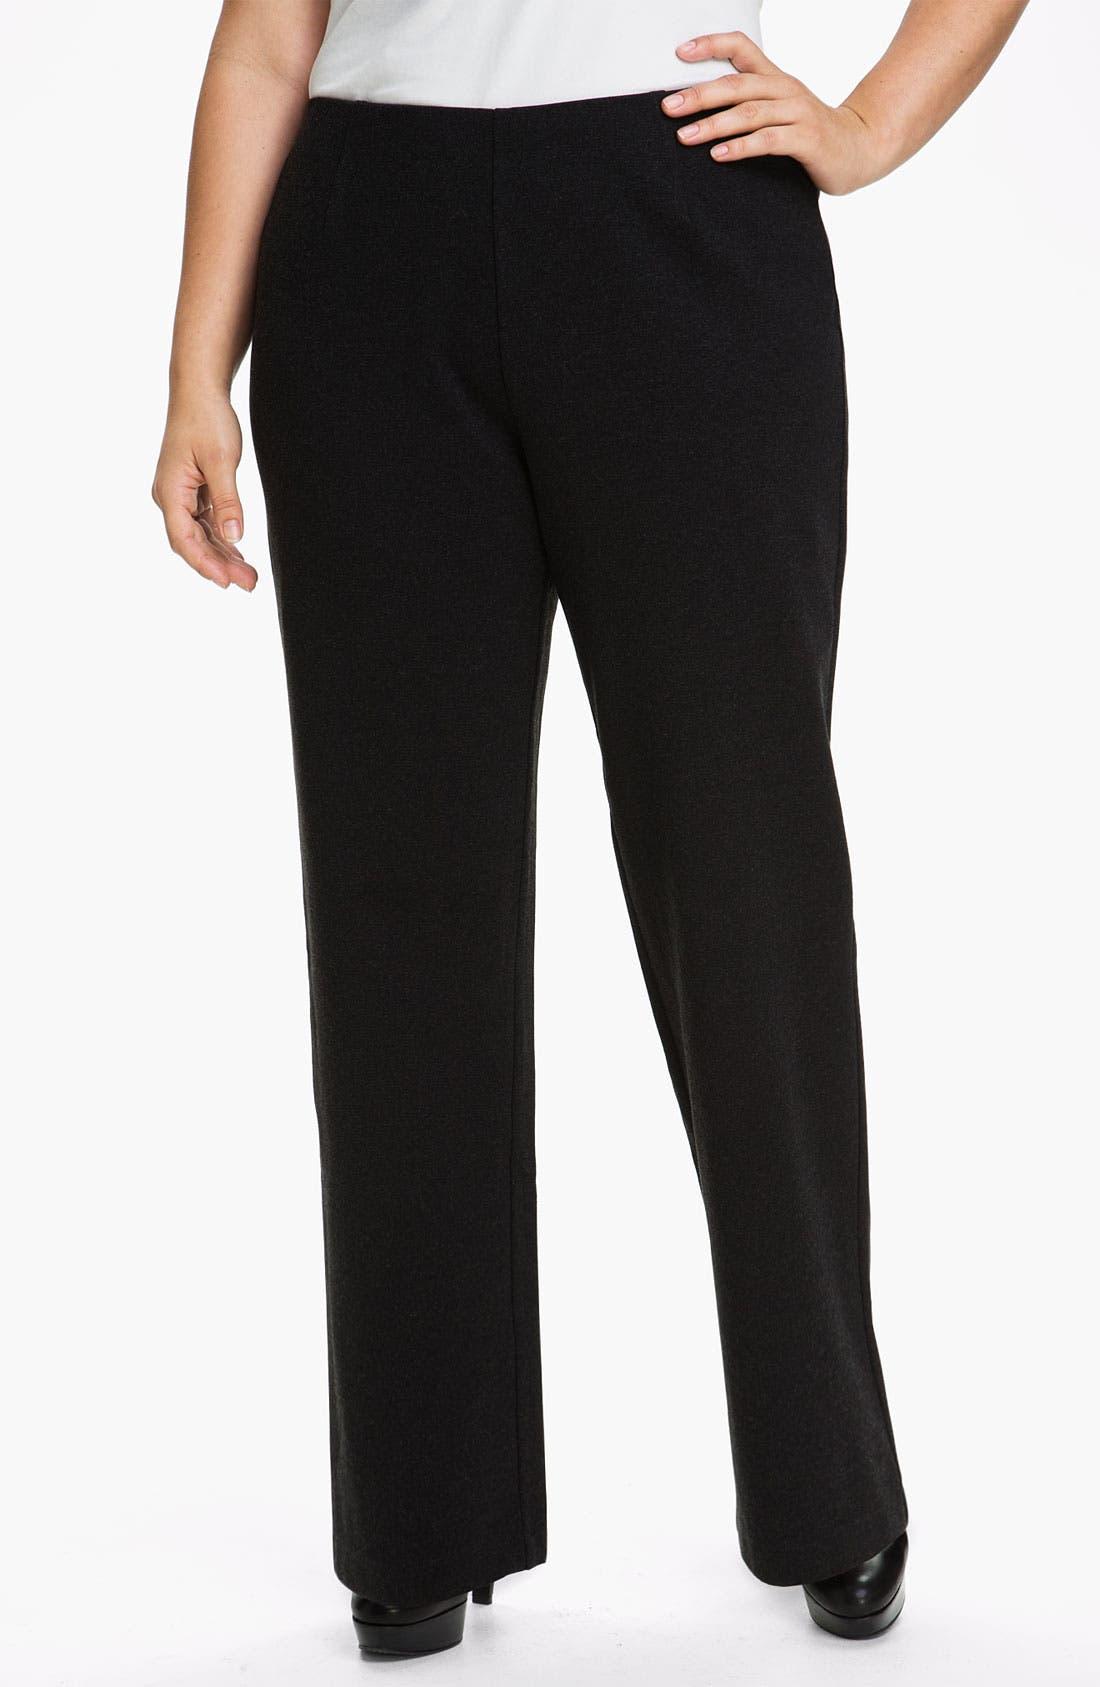 Alternate Image 1 Selected - Eileen Fisher Straight Leg Knit Pants (Plus)